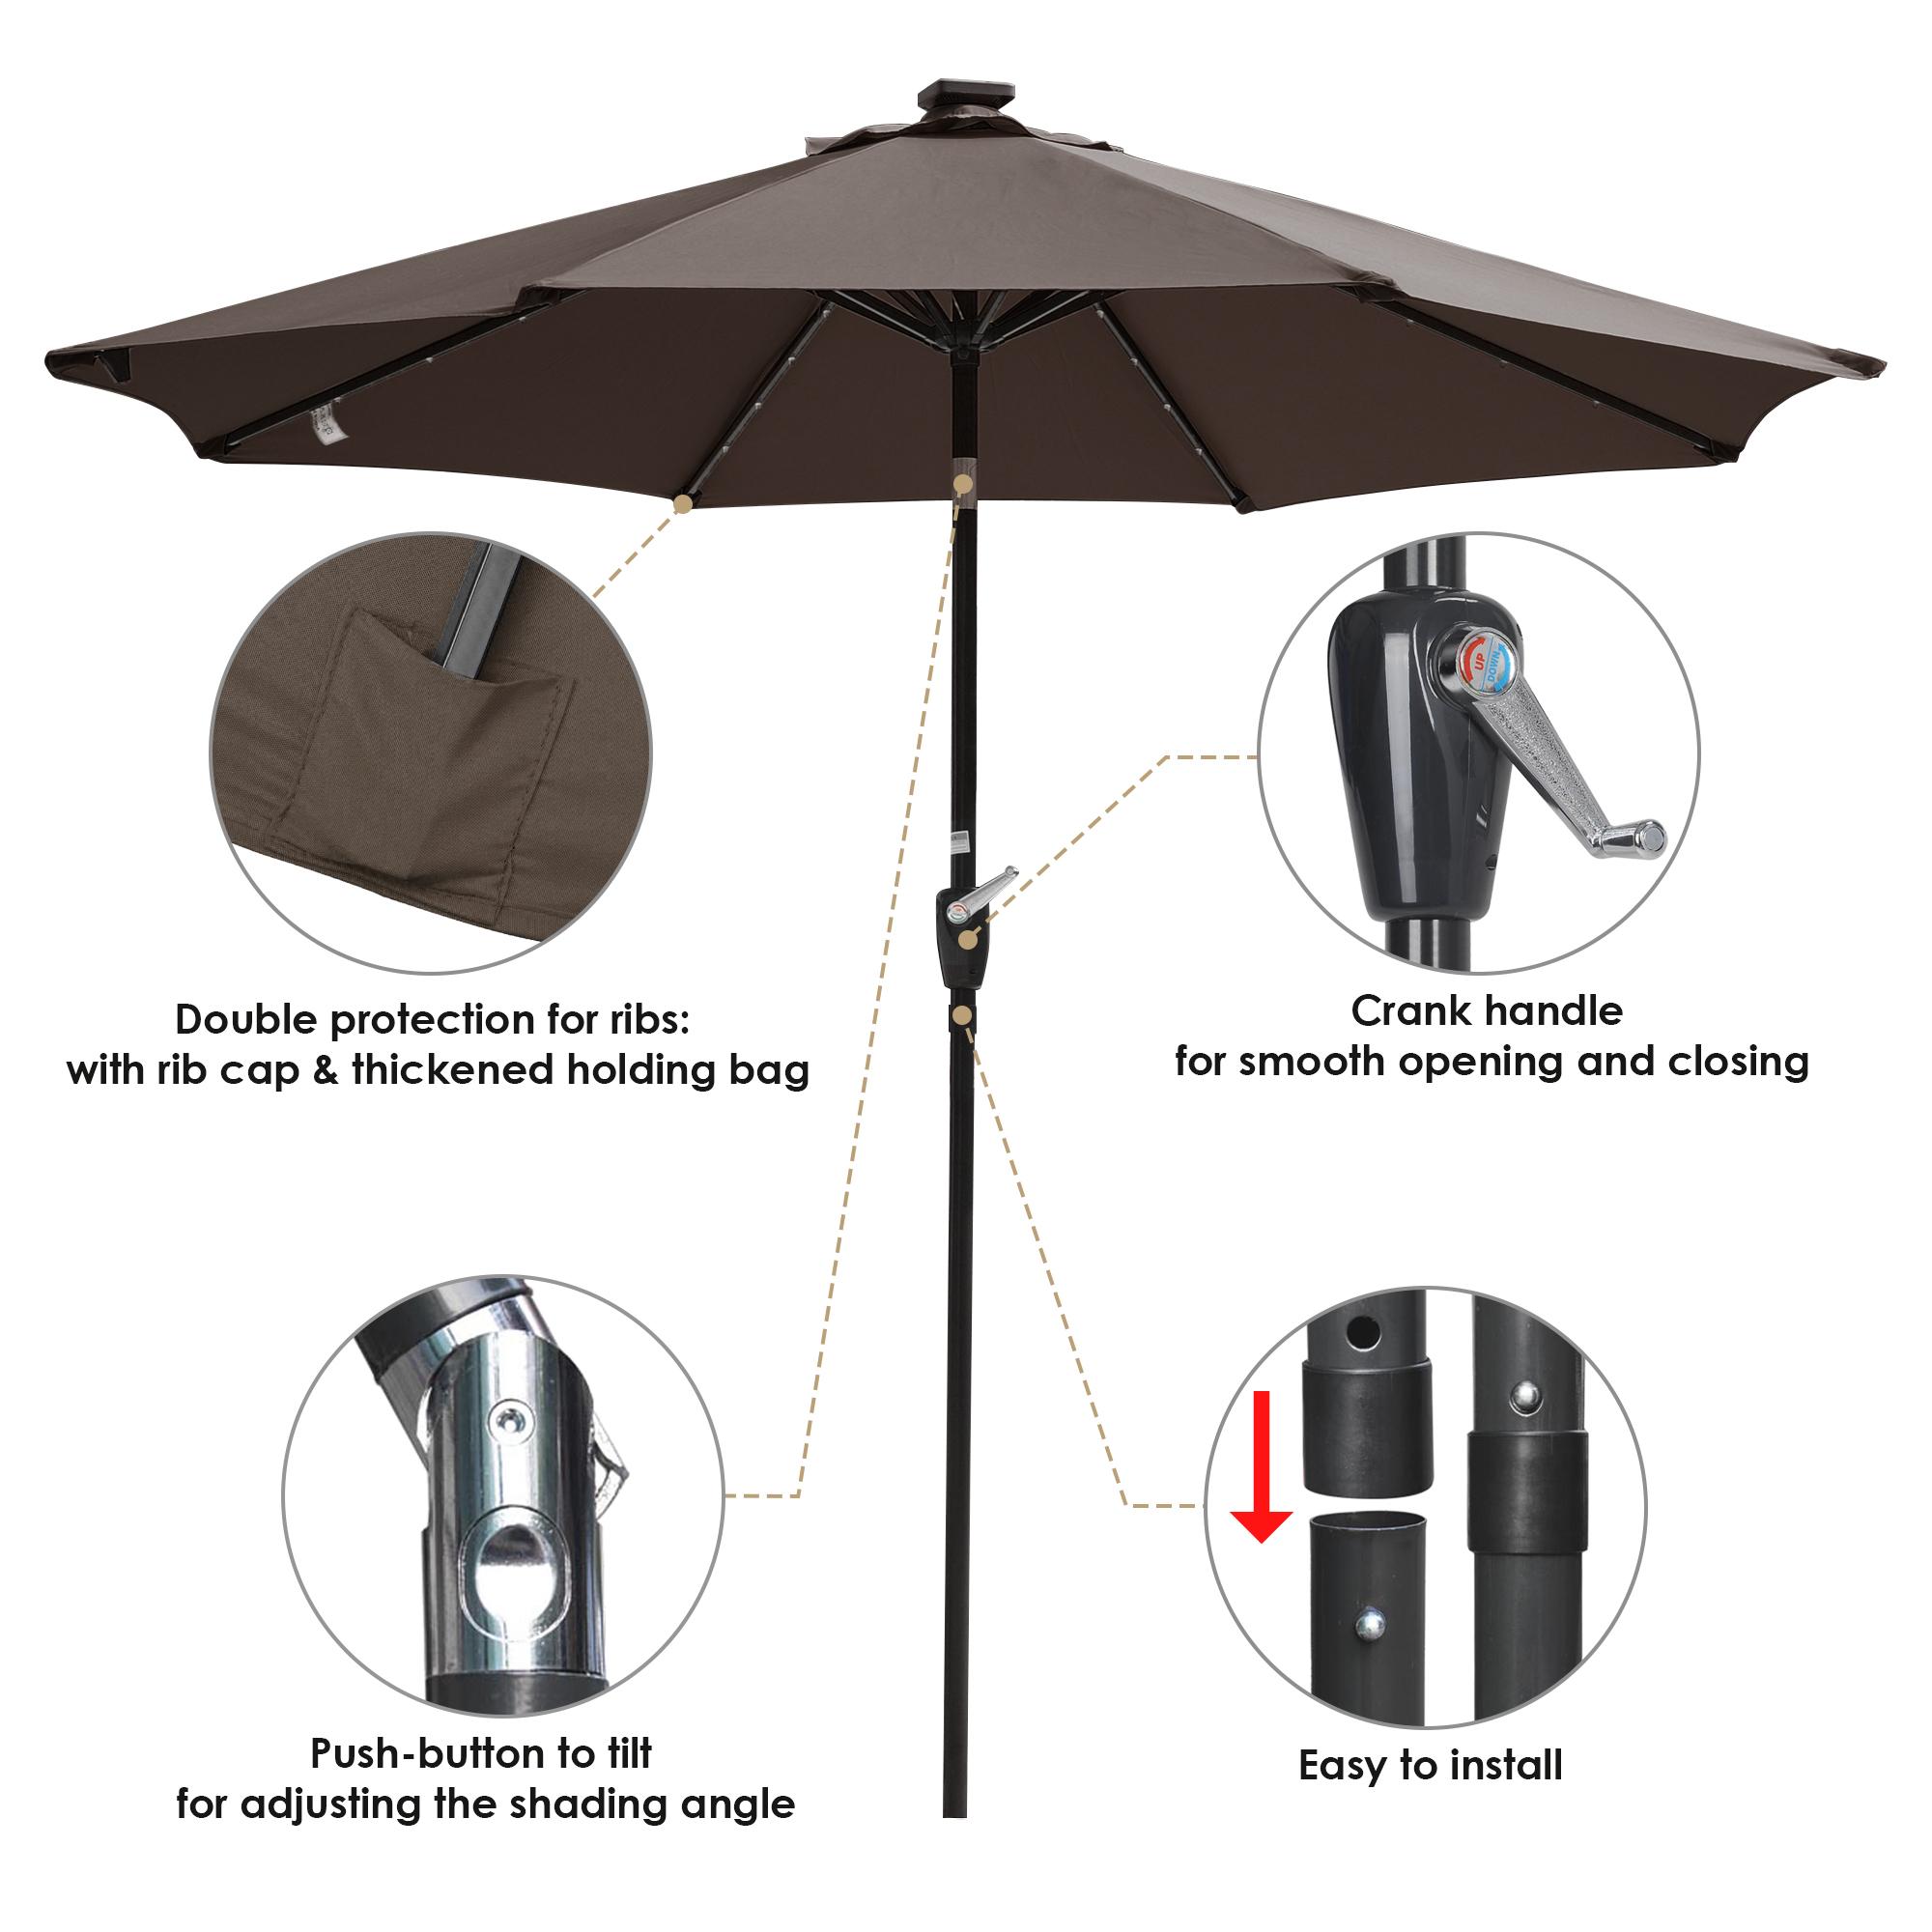 thumbnail 47 - 9' Patio Outdoor Umbrella Solar LED 8 Rib Garden Parasol Yard Deck Table Shade